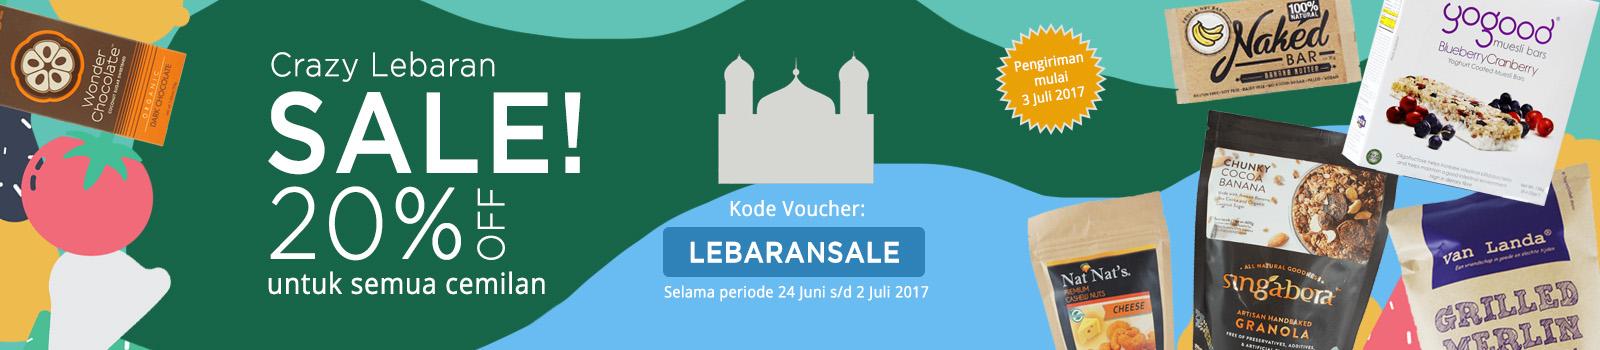 Crazy Lebaran Sale